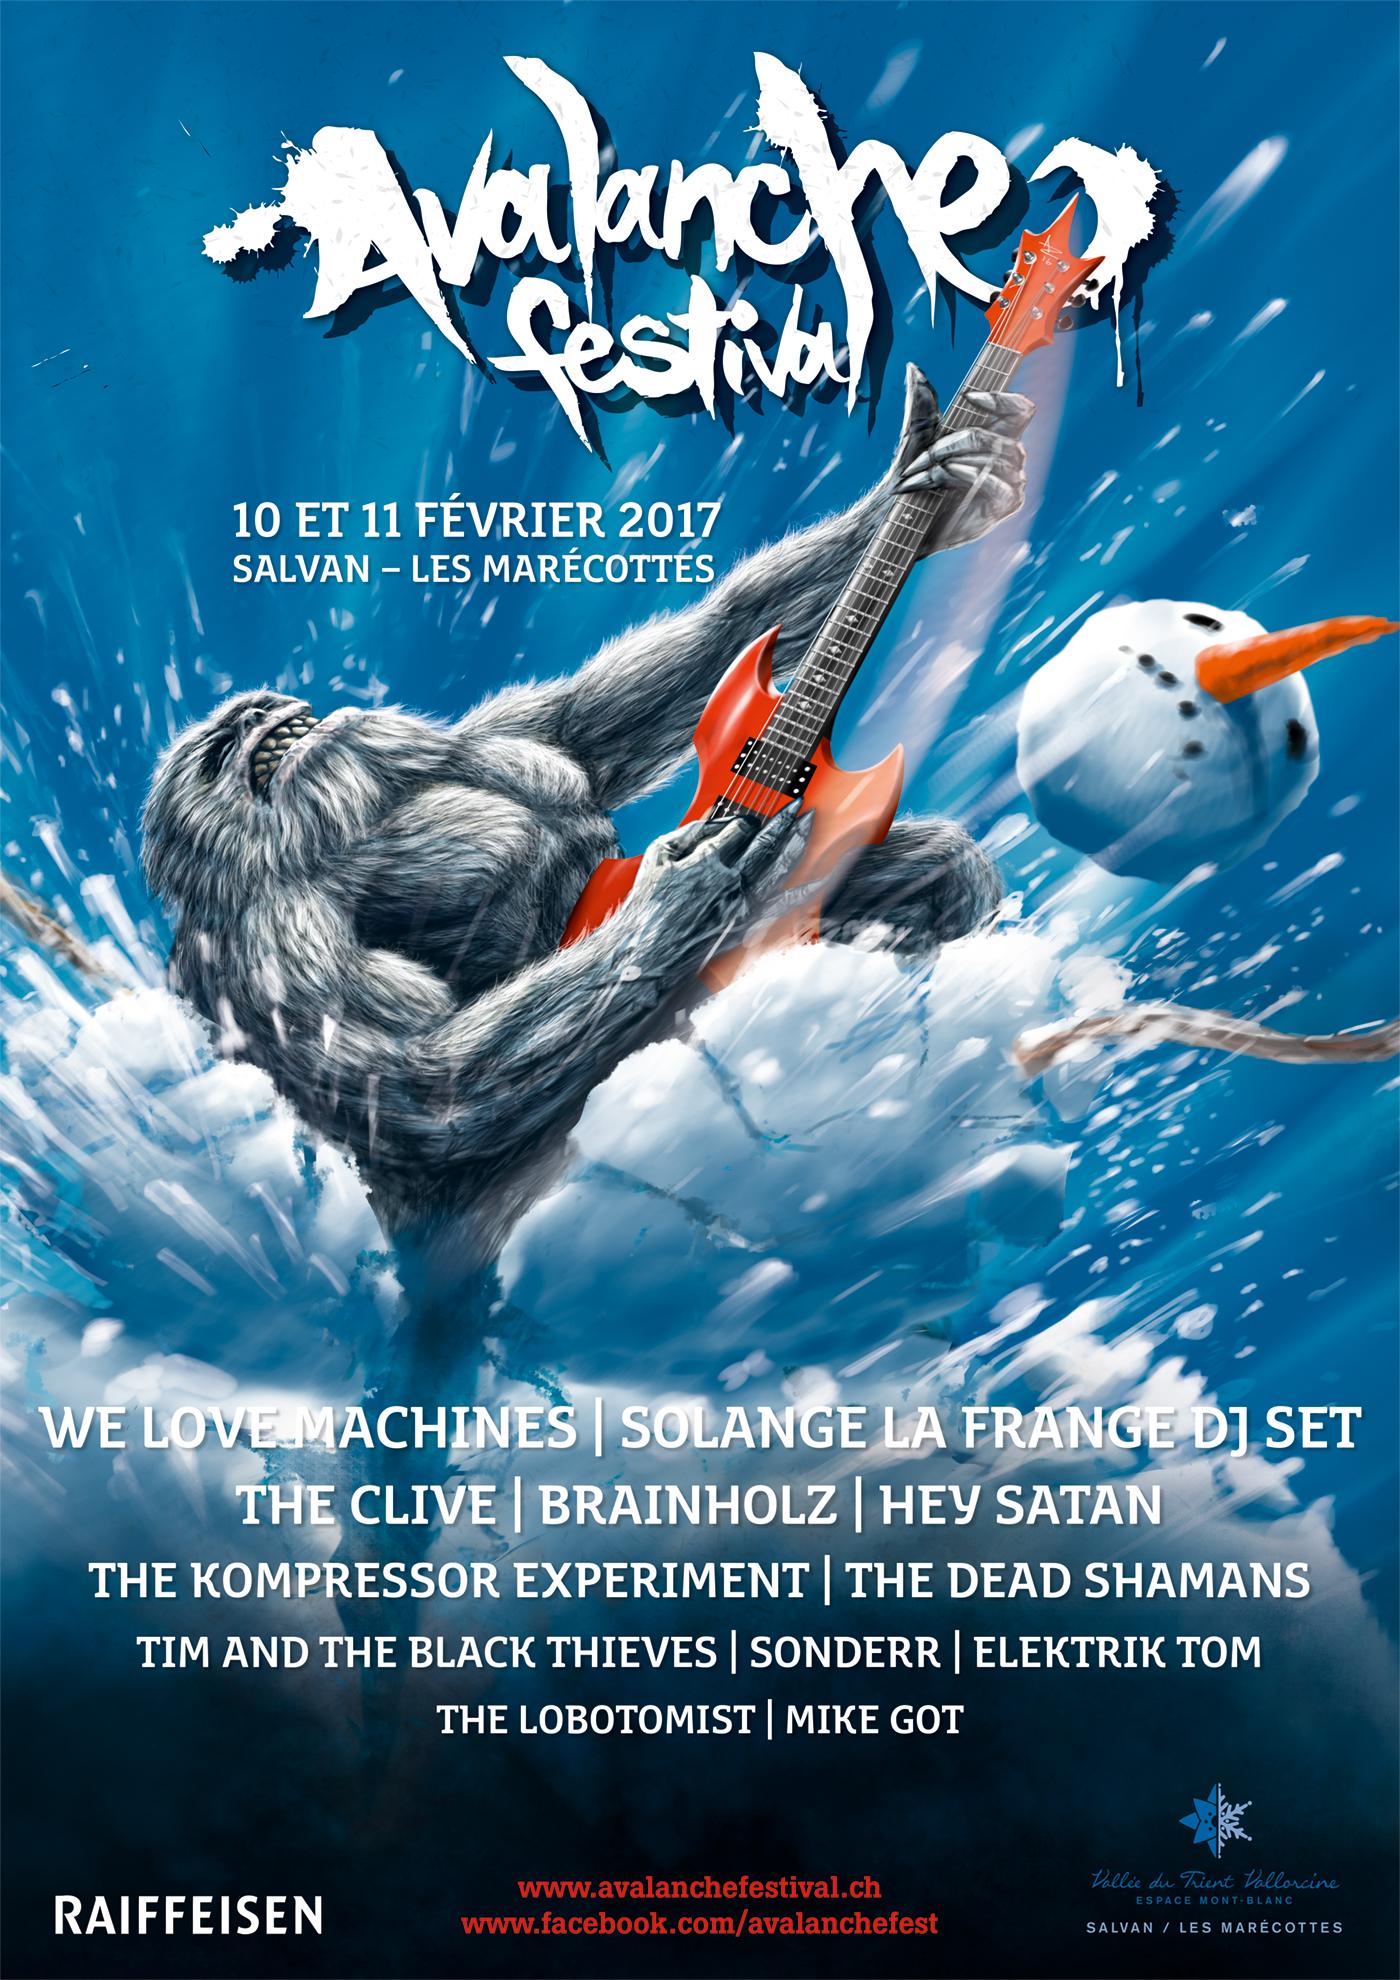 Digital Drawing Avalanche Festival music Music Festival rock metal yeti snow